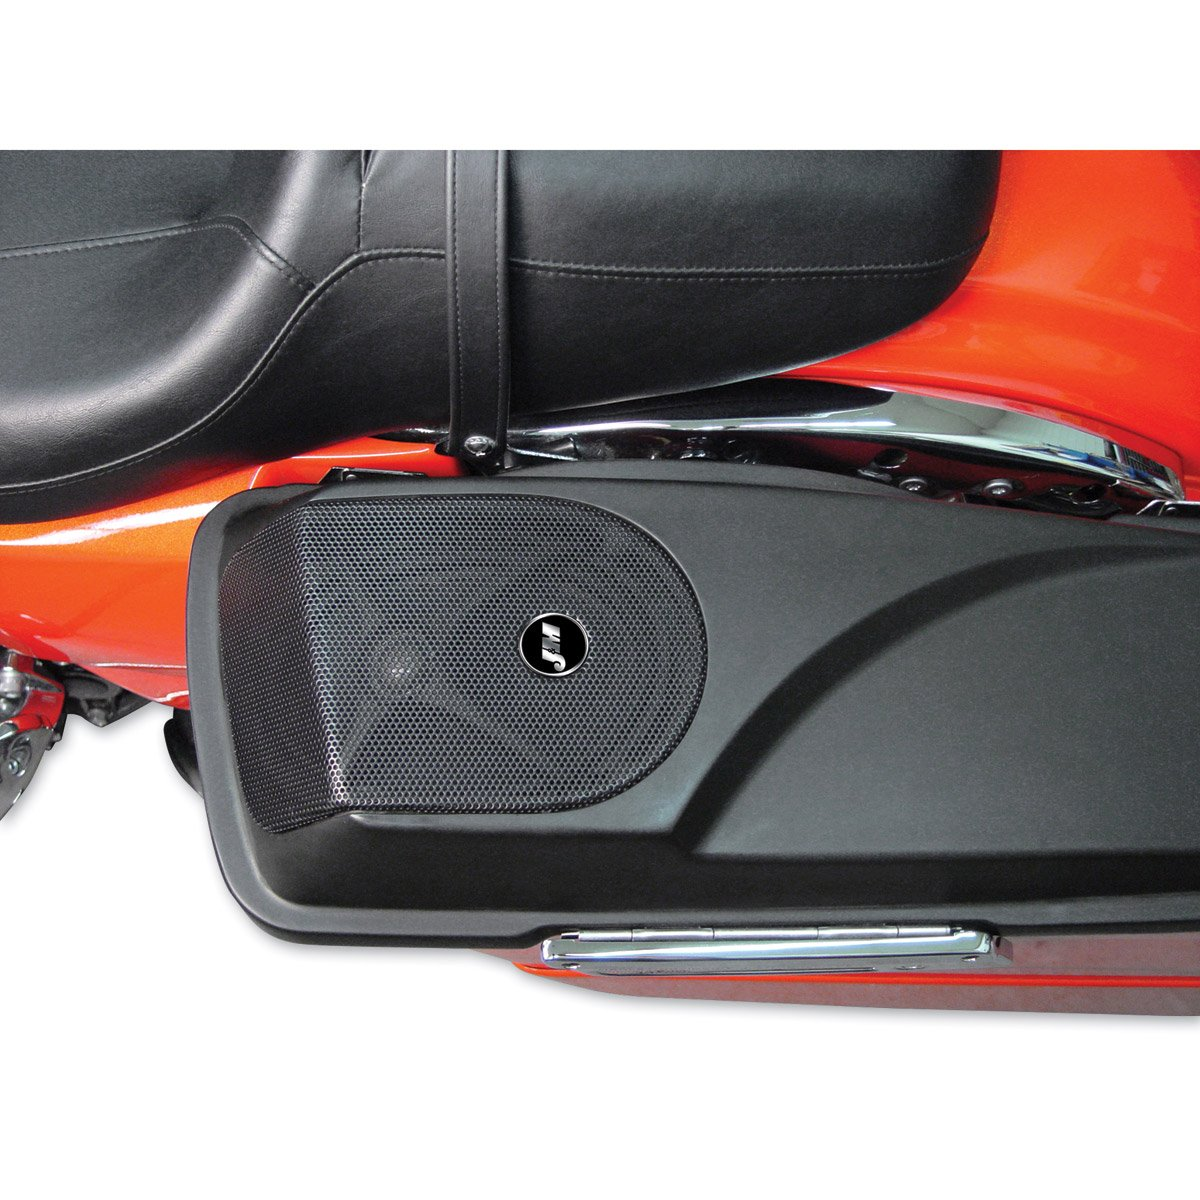 2014 Harley Saddlebag Speaker Wiring Diagram | Wiring Liry on